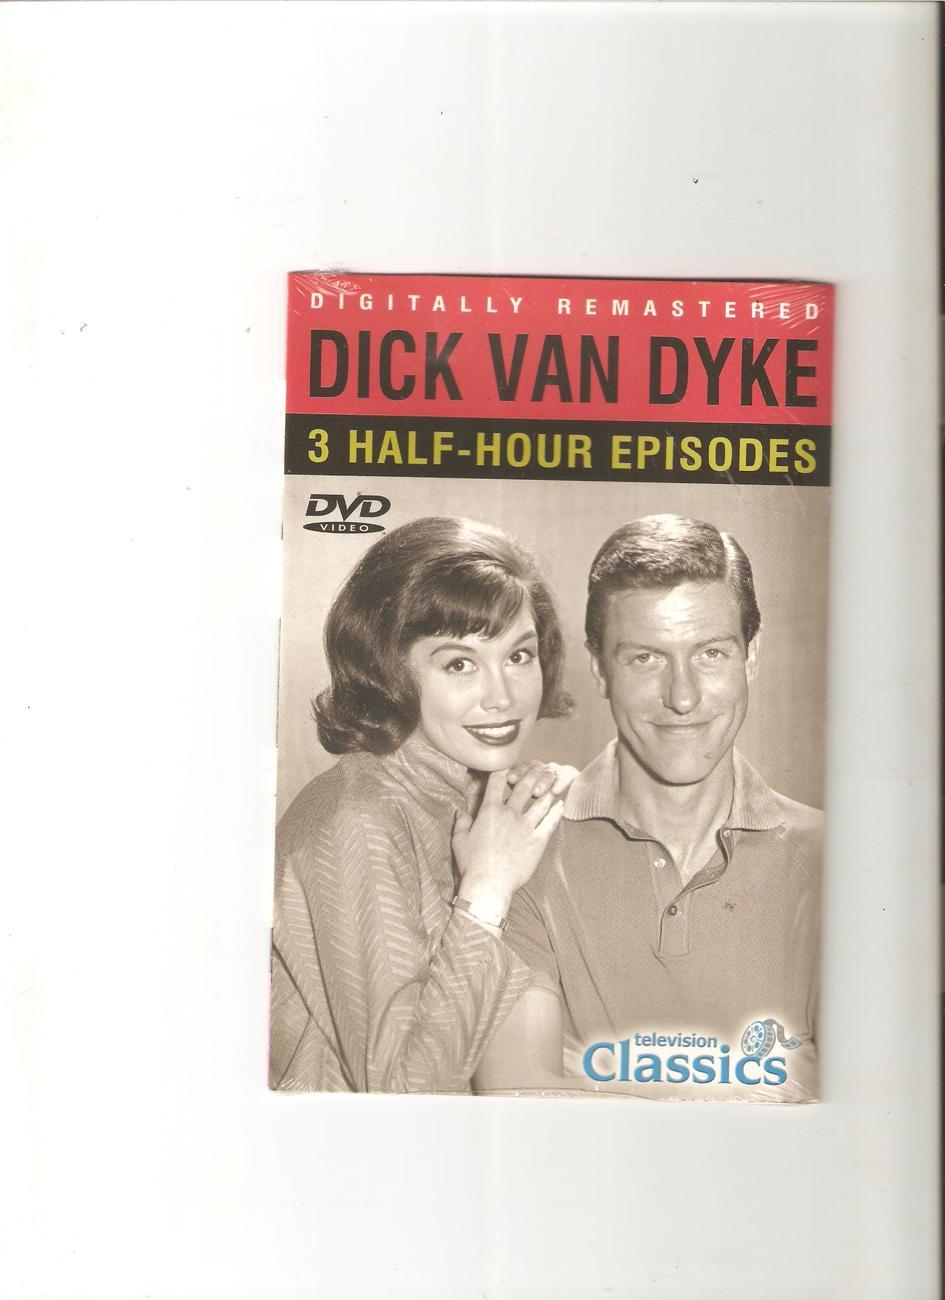 Dick Van Dyke - Wikipedia